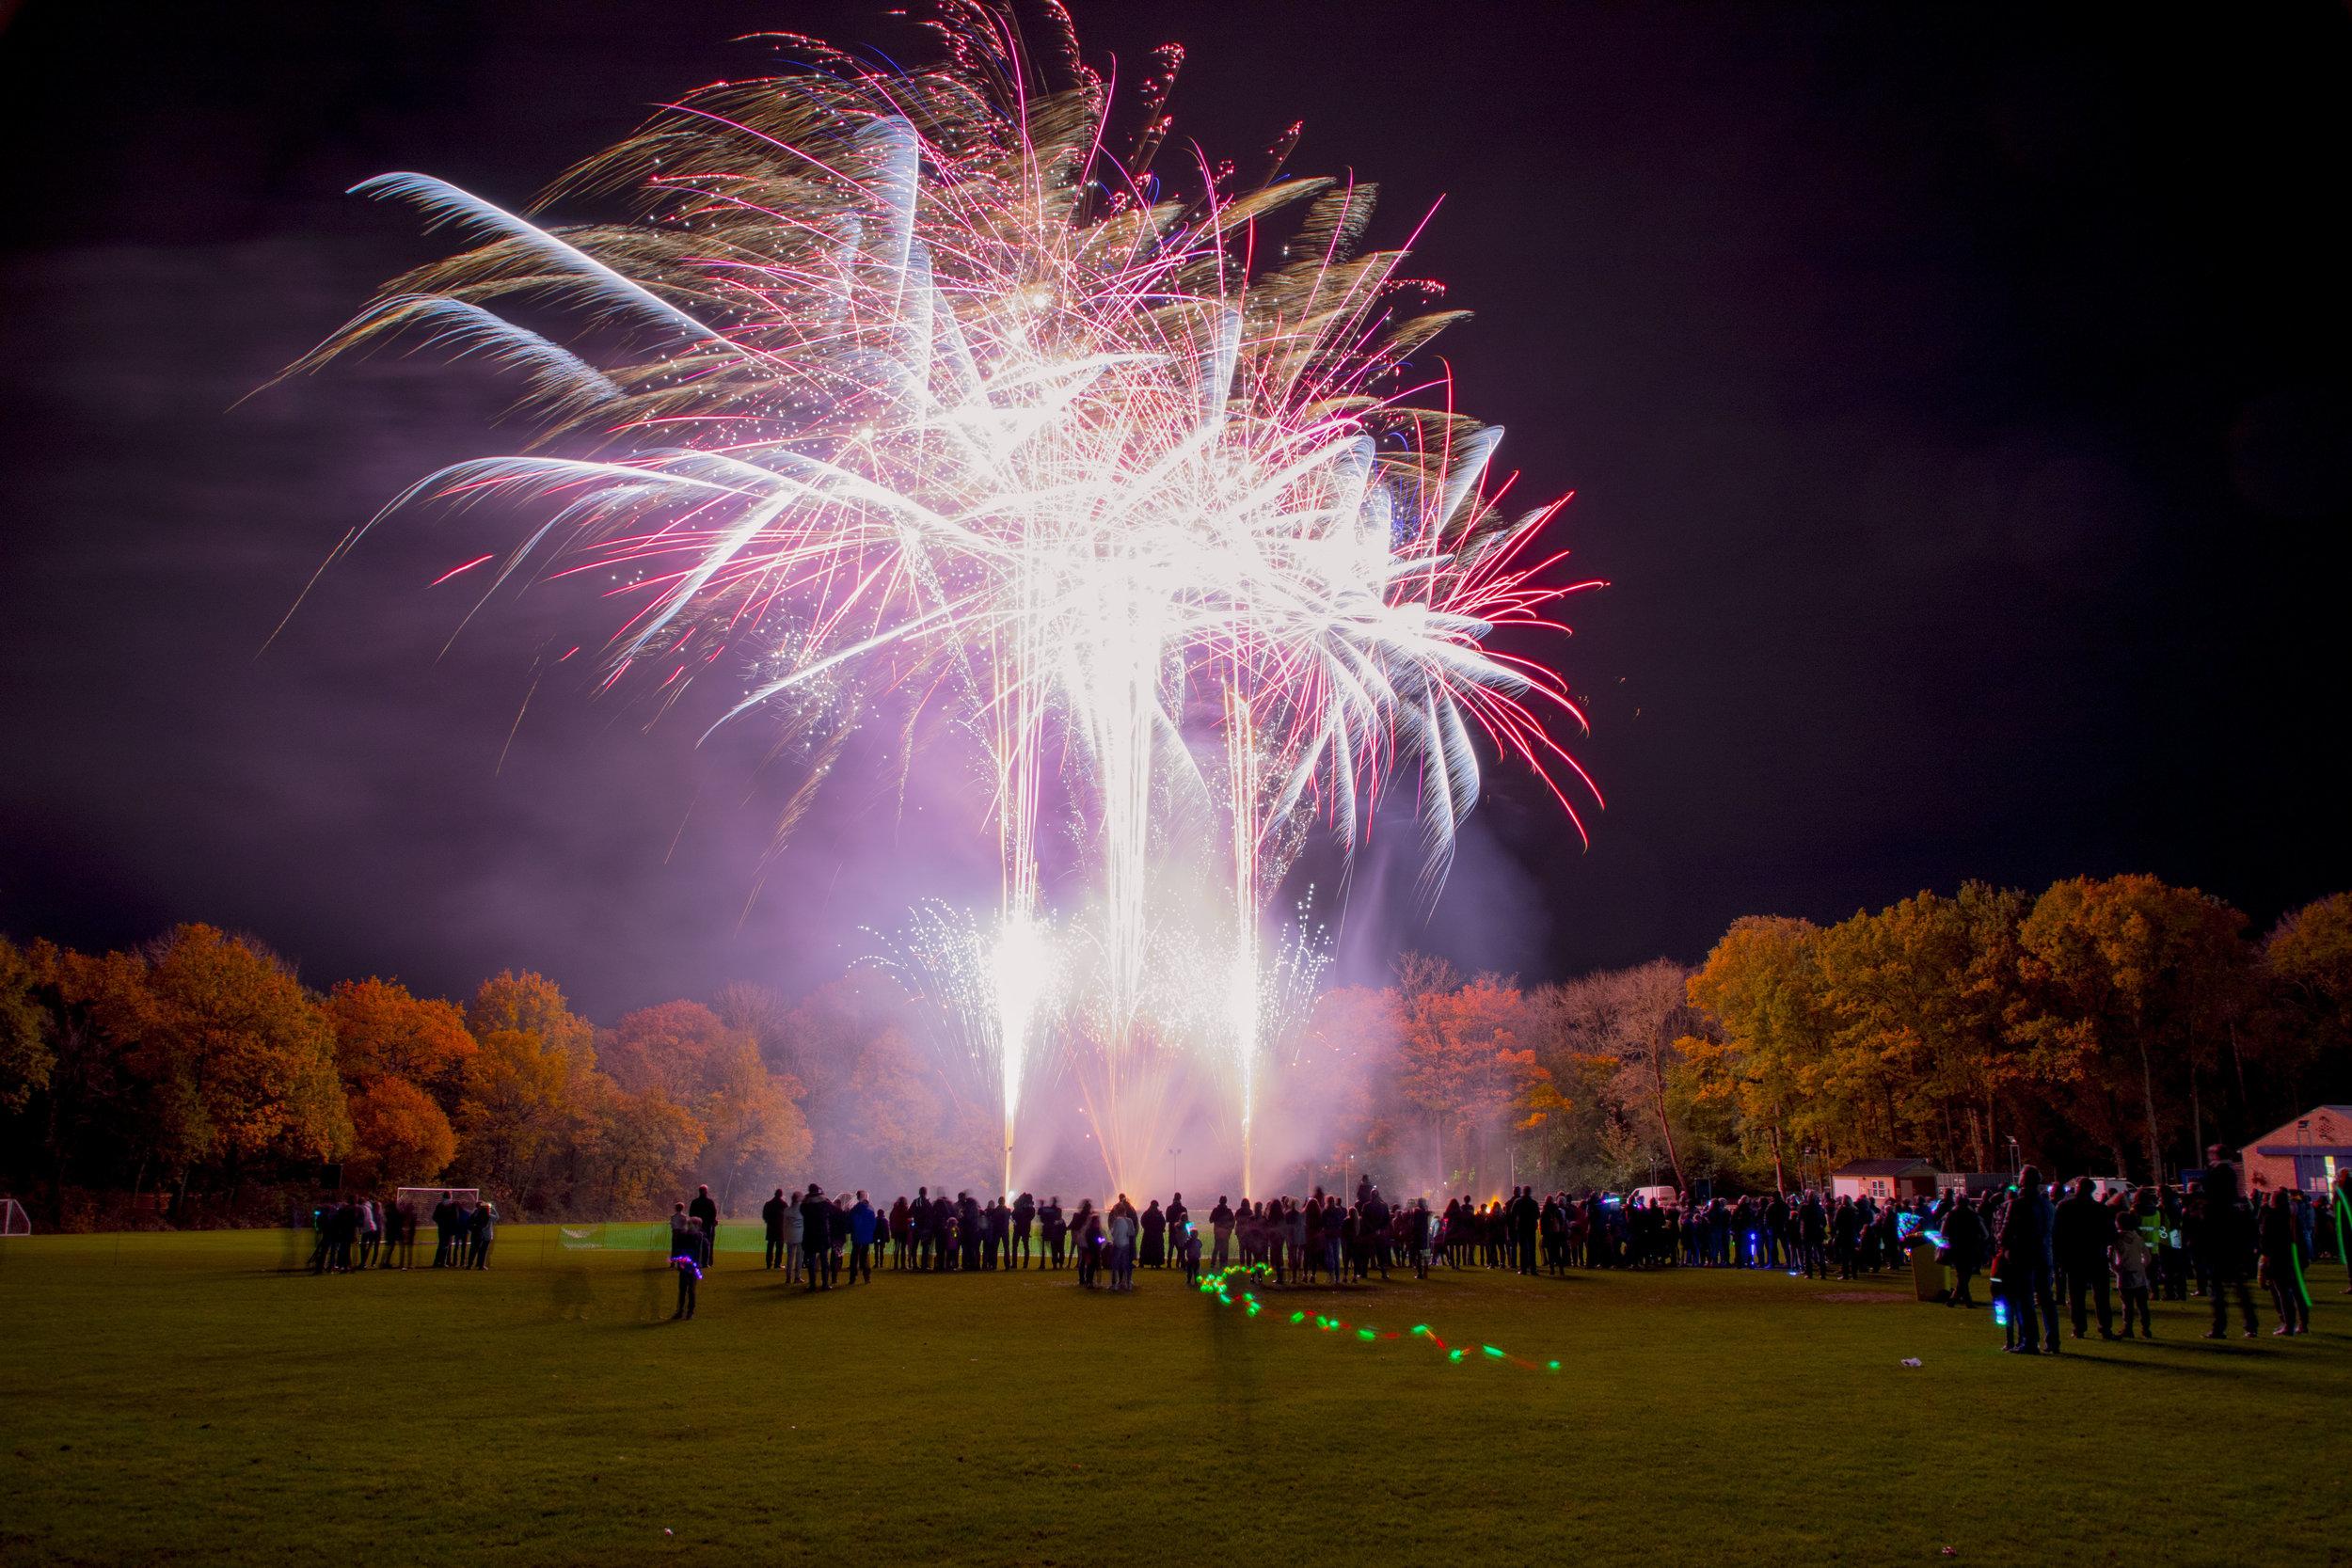 A typical school firework display by Star Fireworks